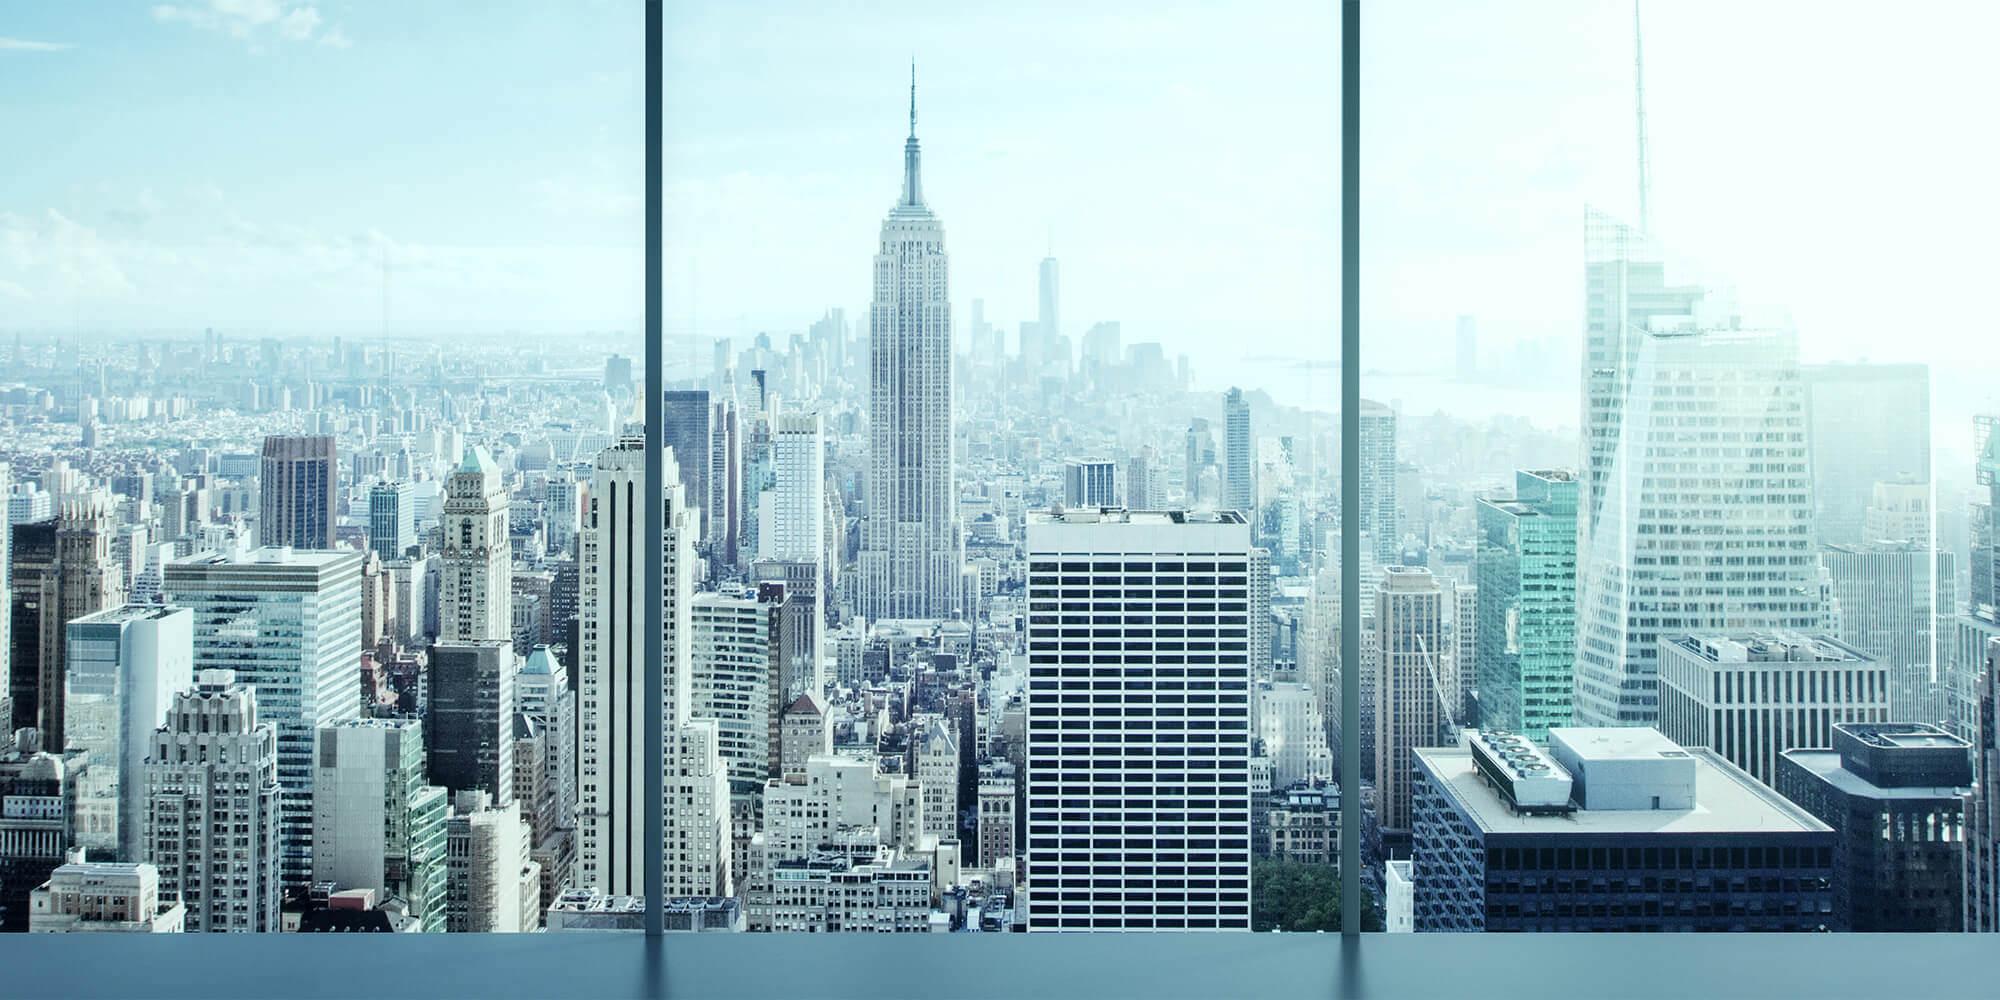 Geschlossene Immobilienfonds nicht für Stiftungen geeignet